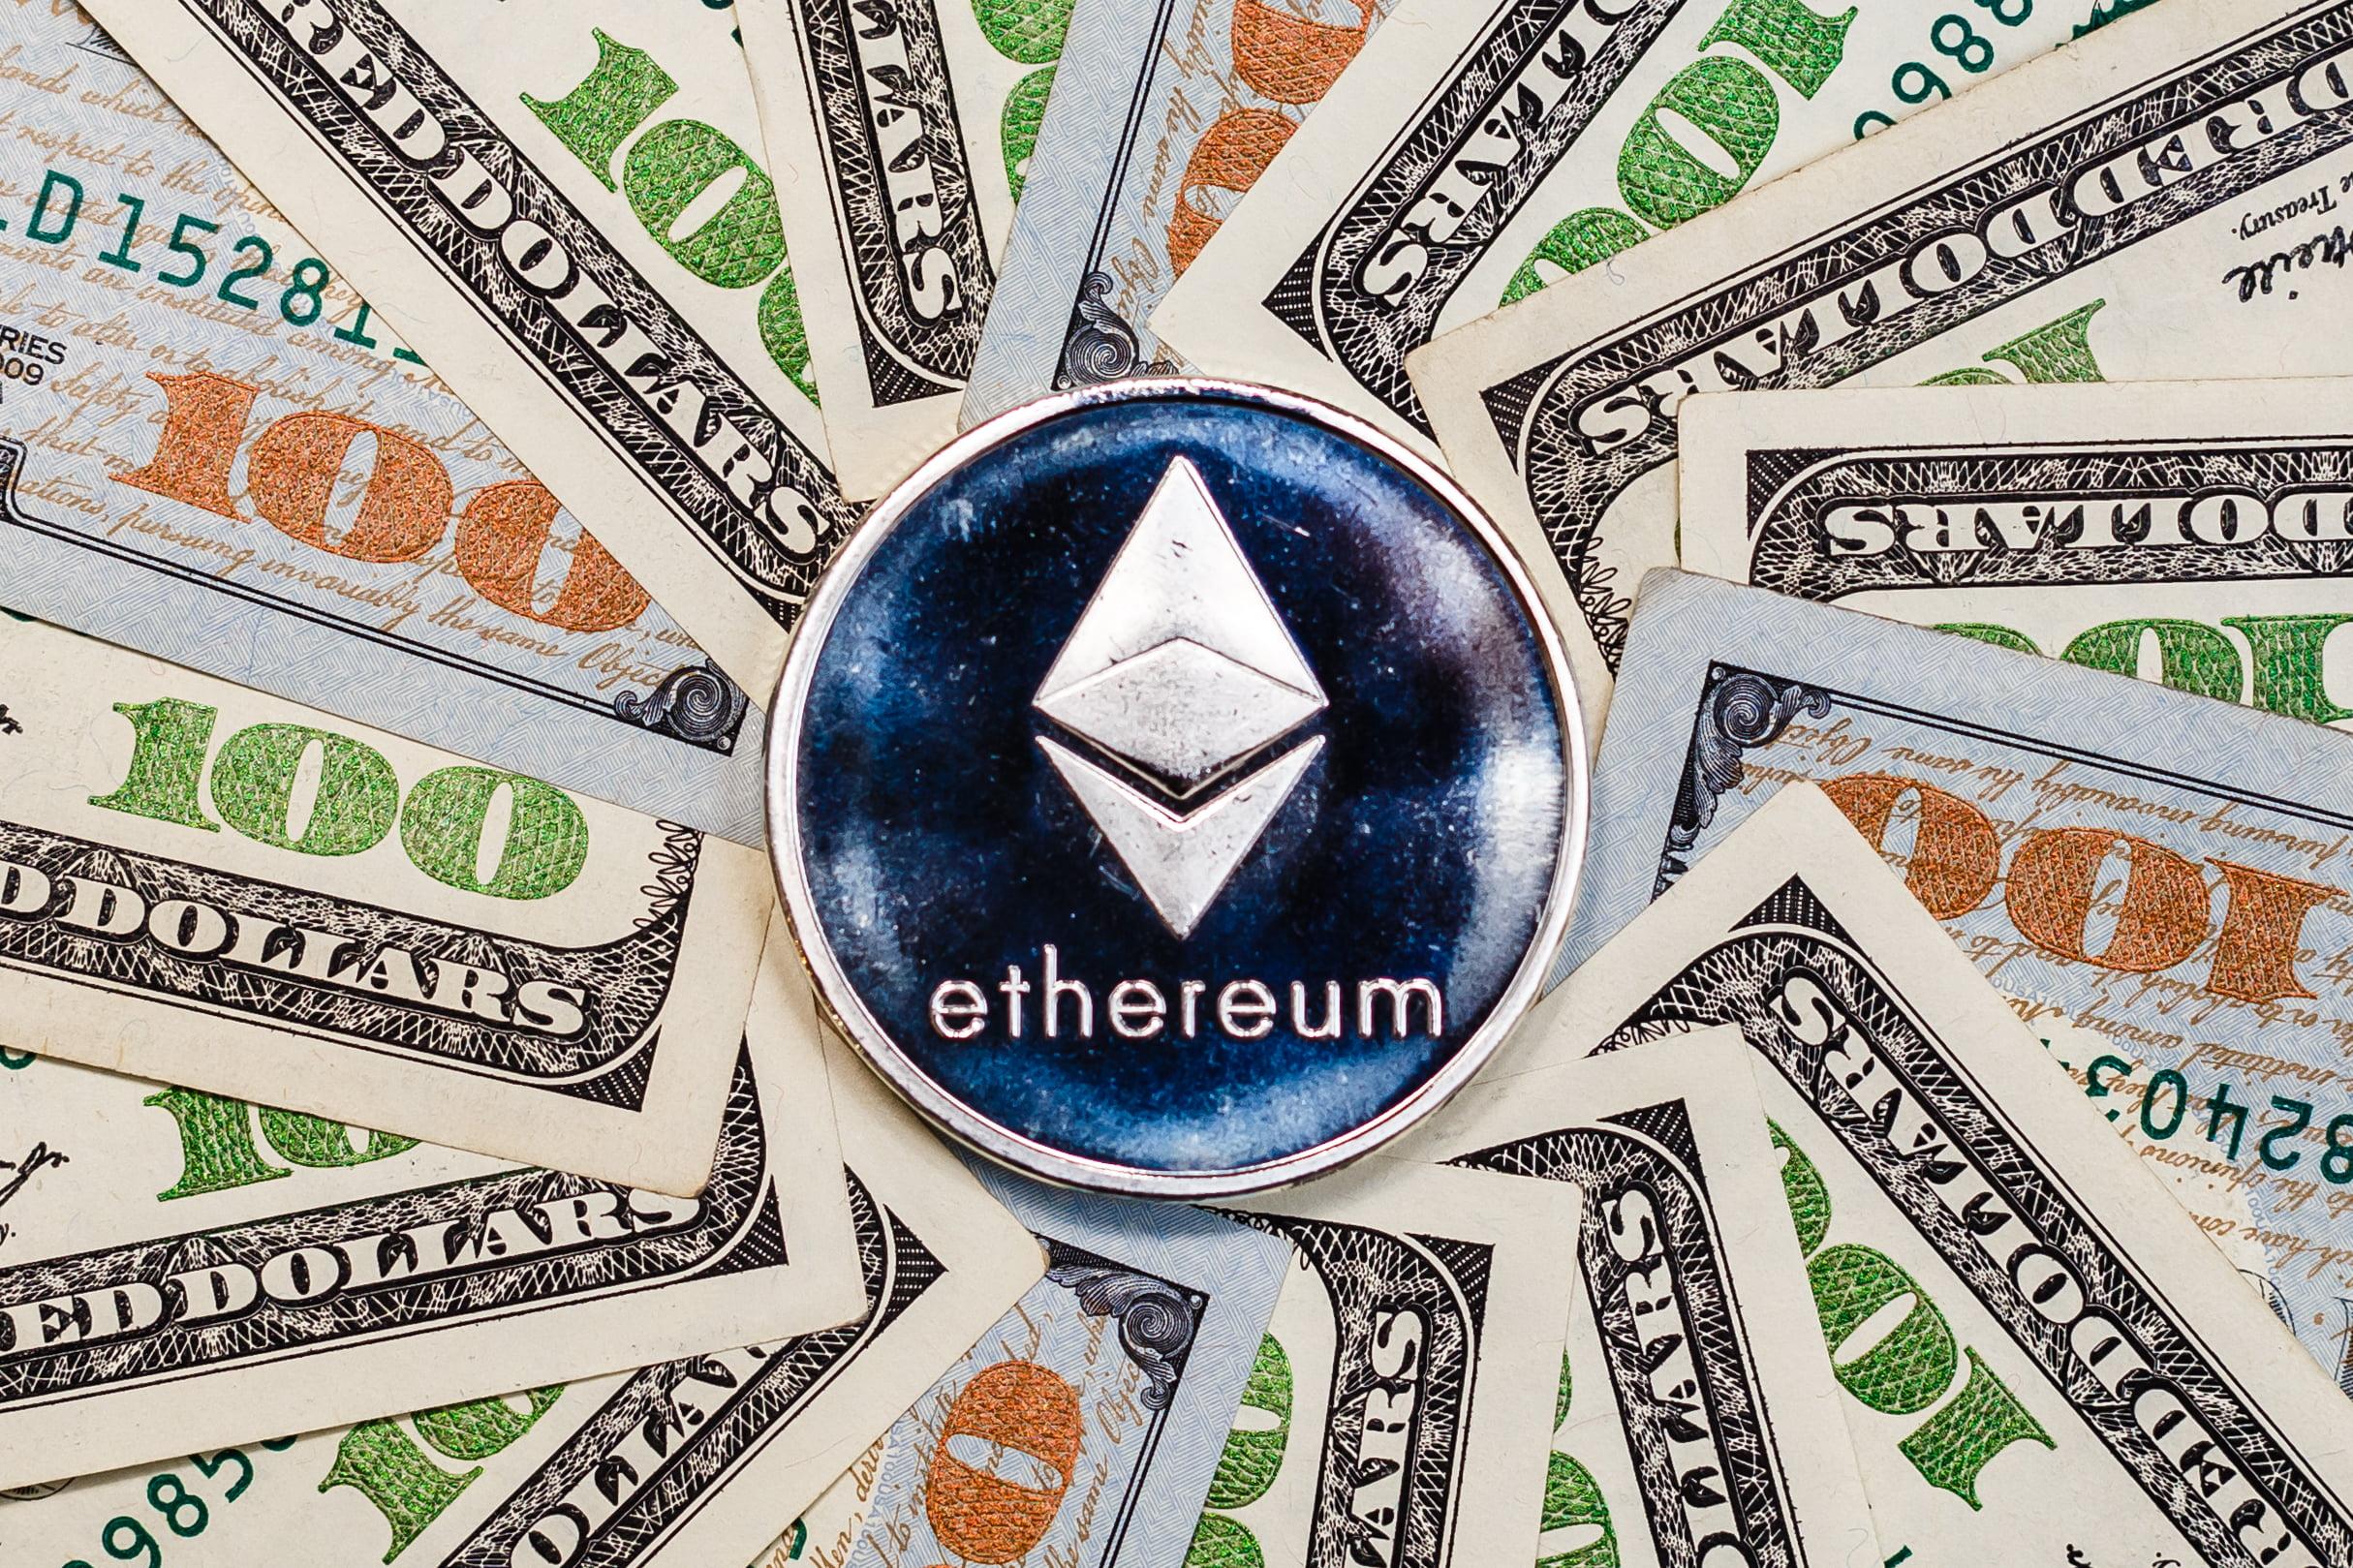 ethereum defi crypto altcoin ethusd